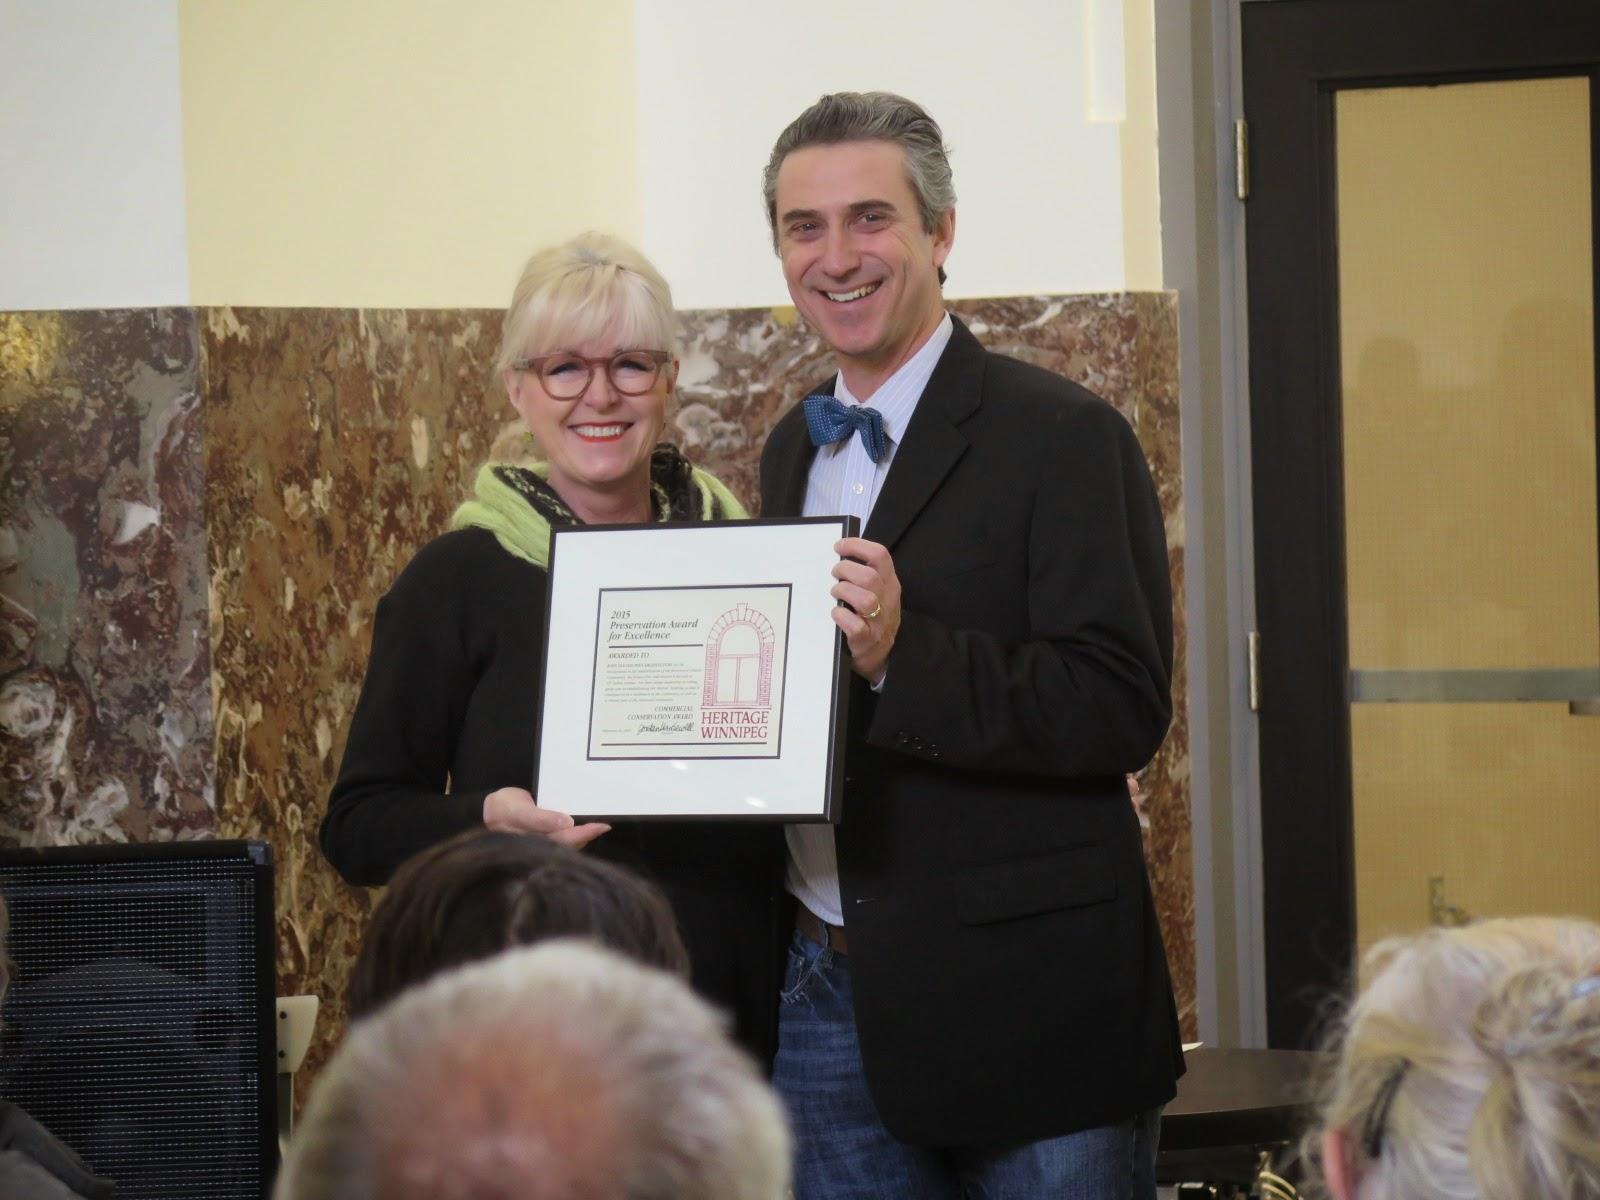 Architect John Van Leeuwen accepts award from HW Board Member Lisa Gardewine.